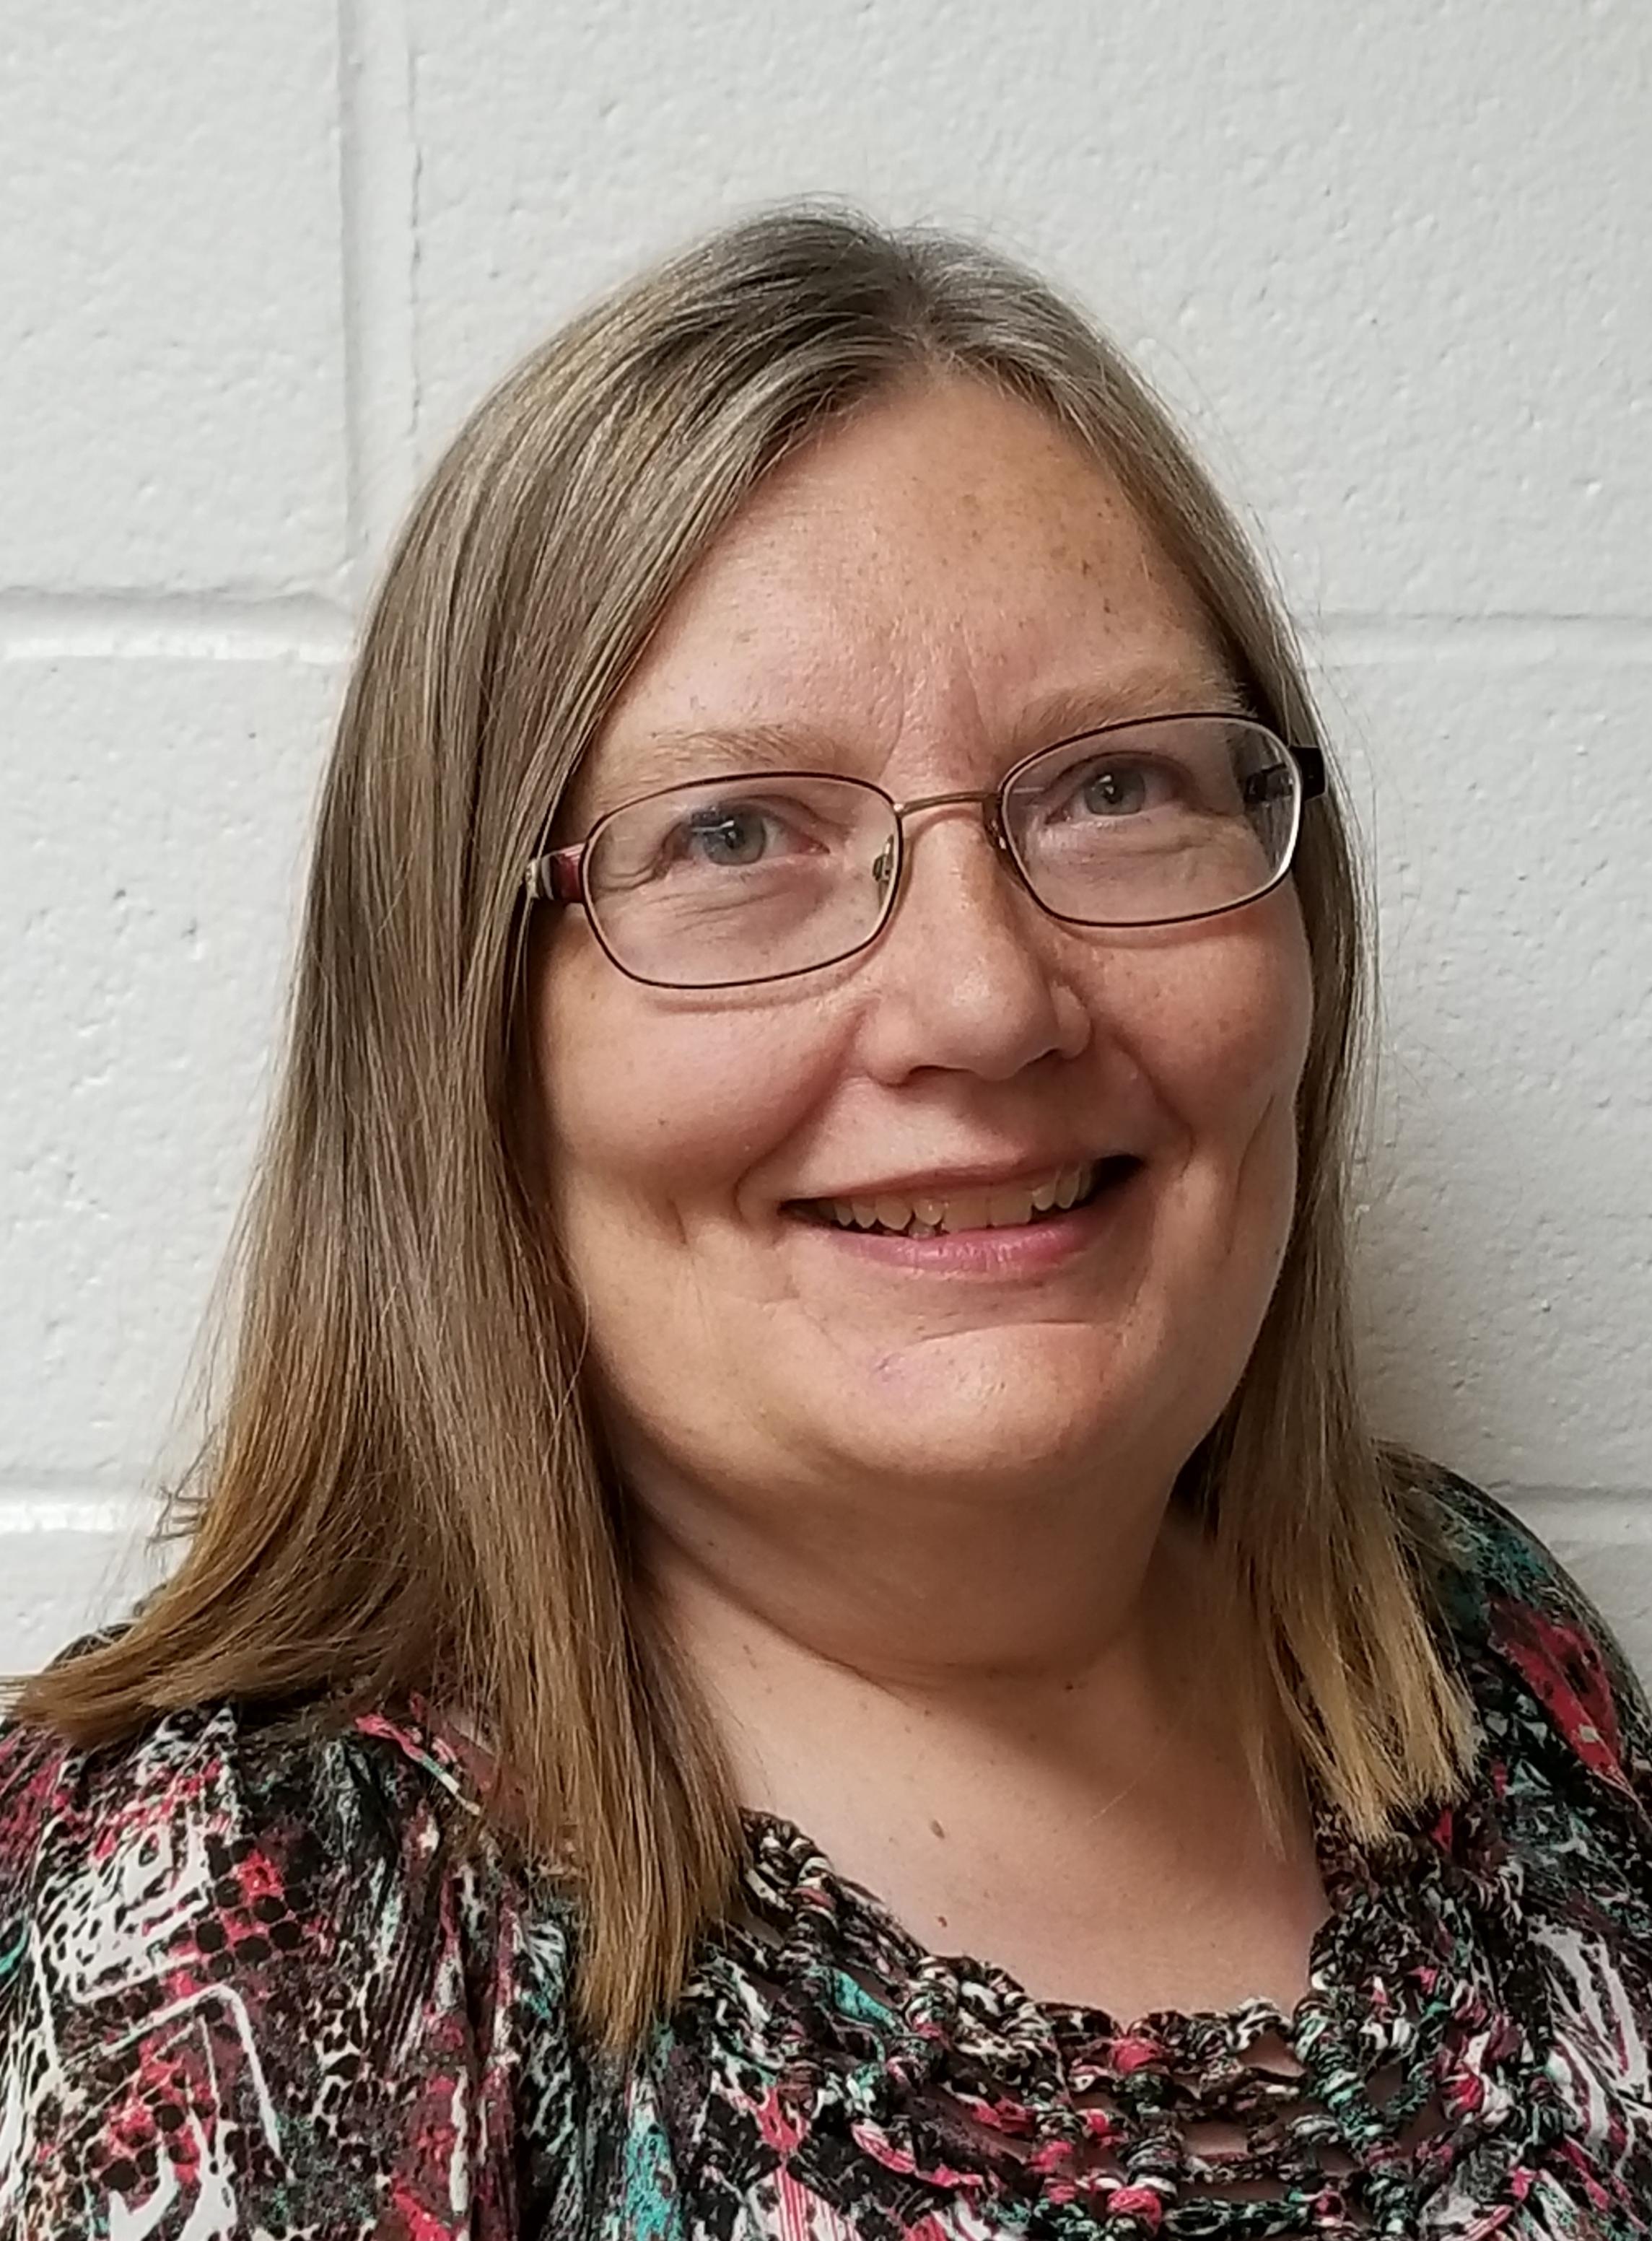 Linda Porterfield